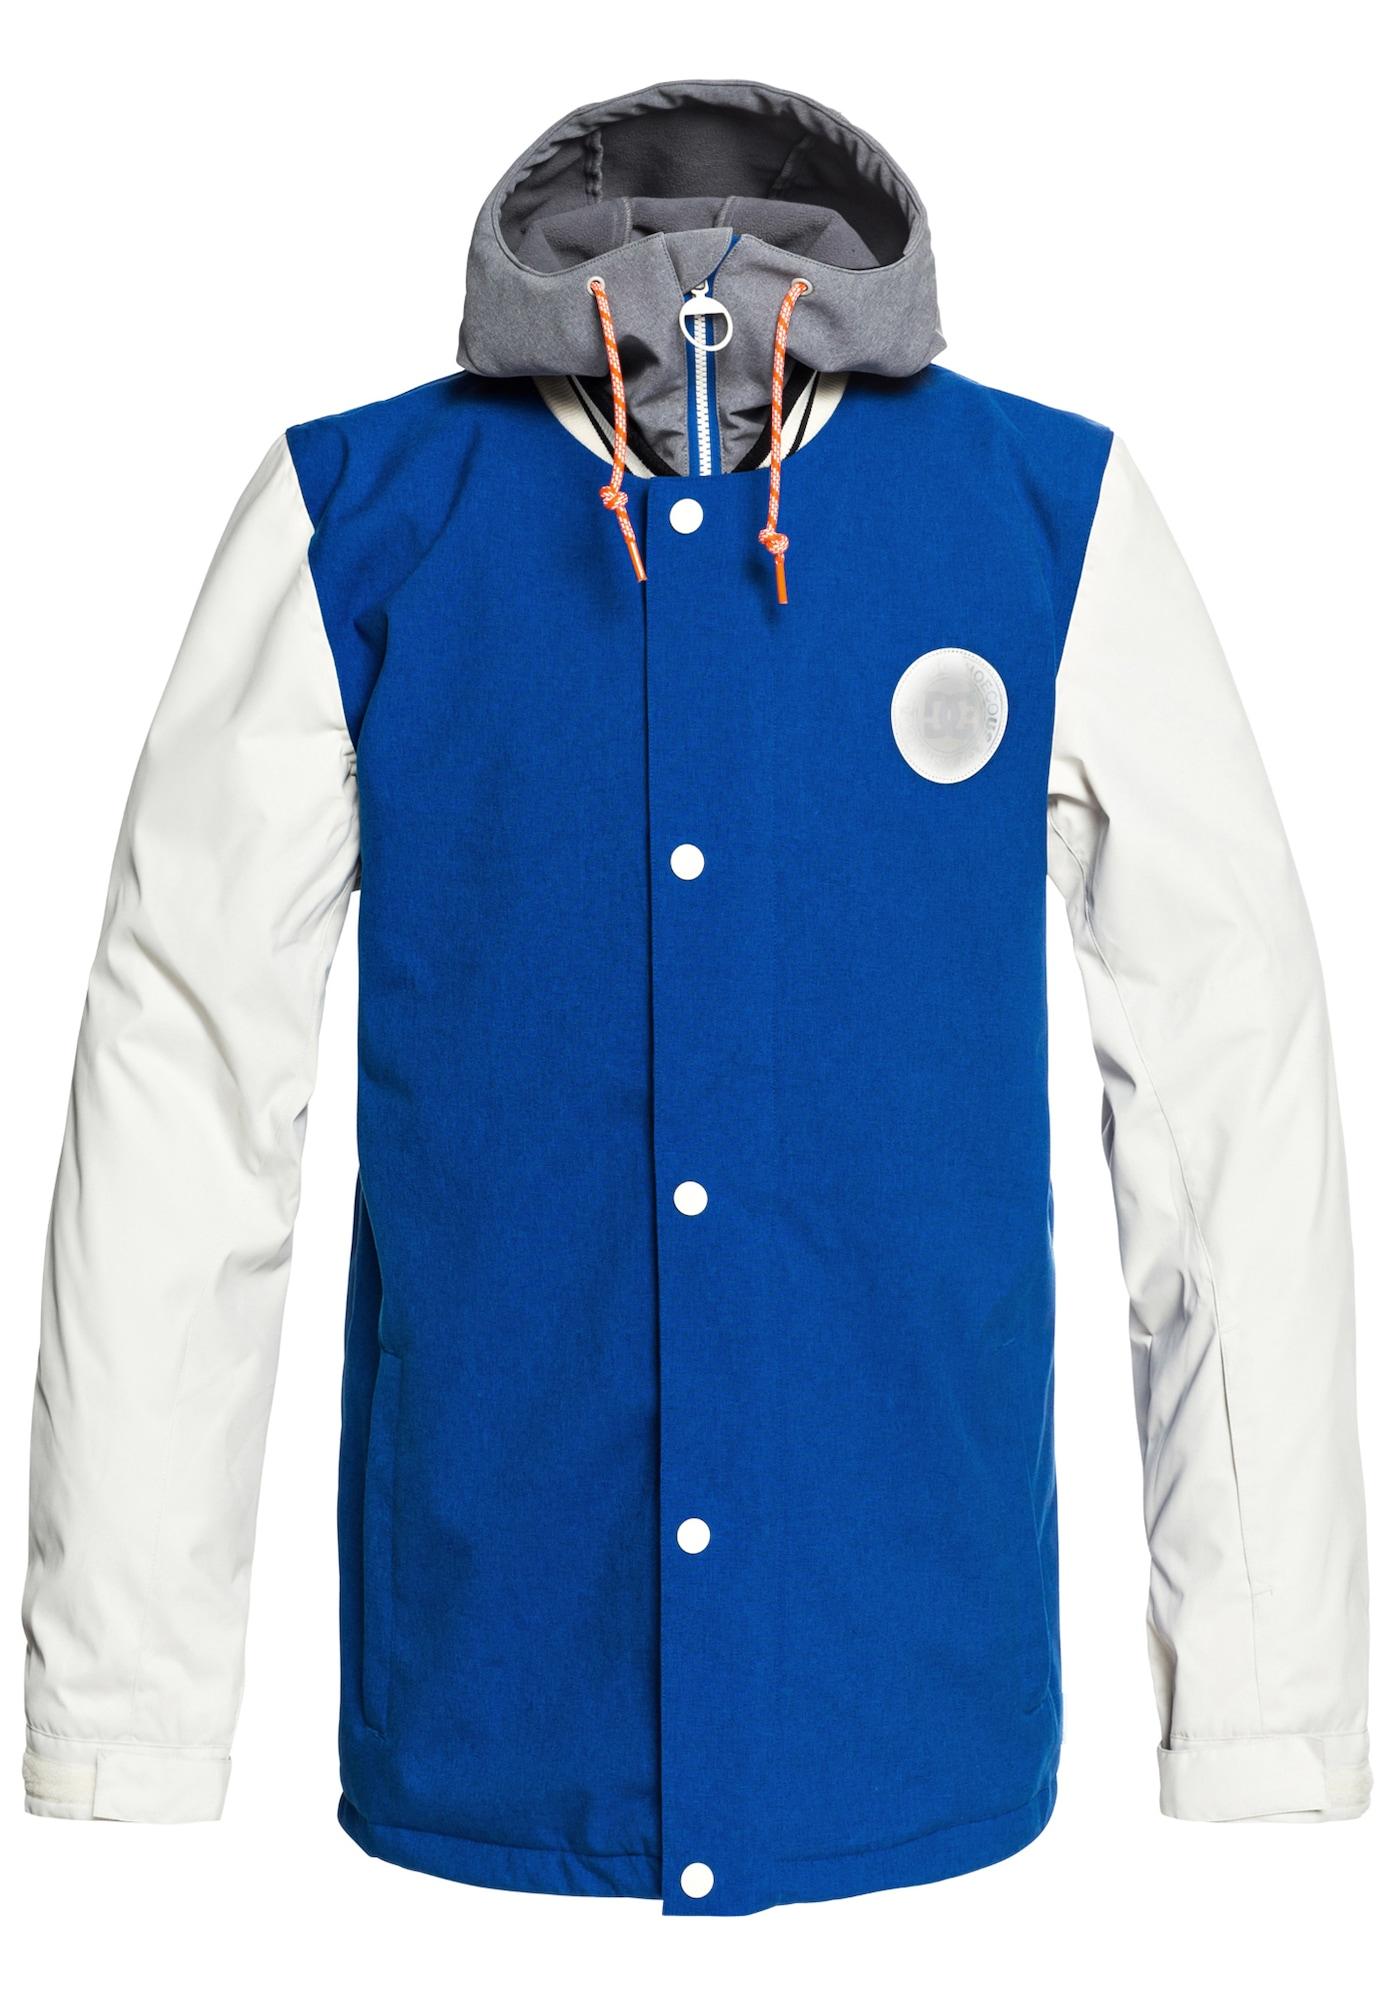 Snowboardjacke | Sportbekleidung > Sportjacken > Snowboardjacken | Blau - Grau | DC Shoes